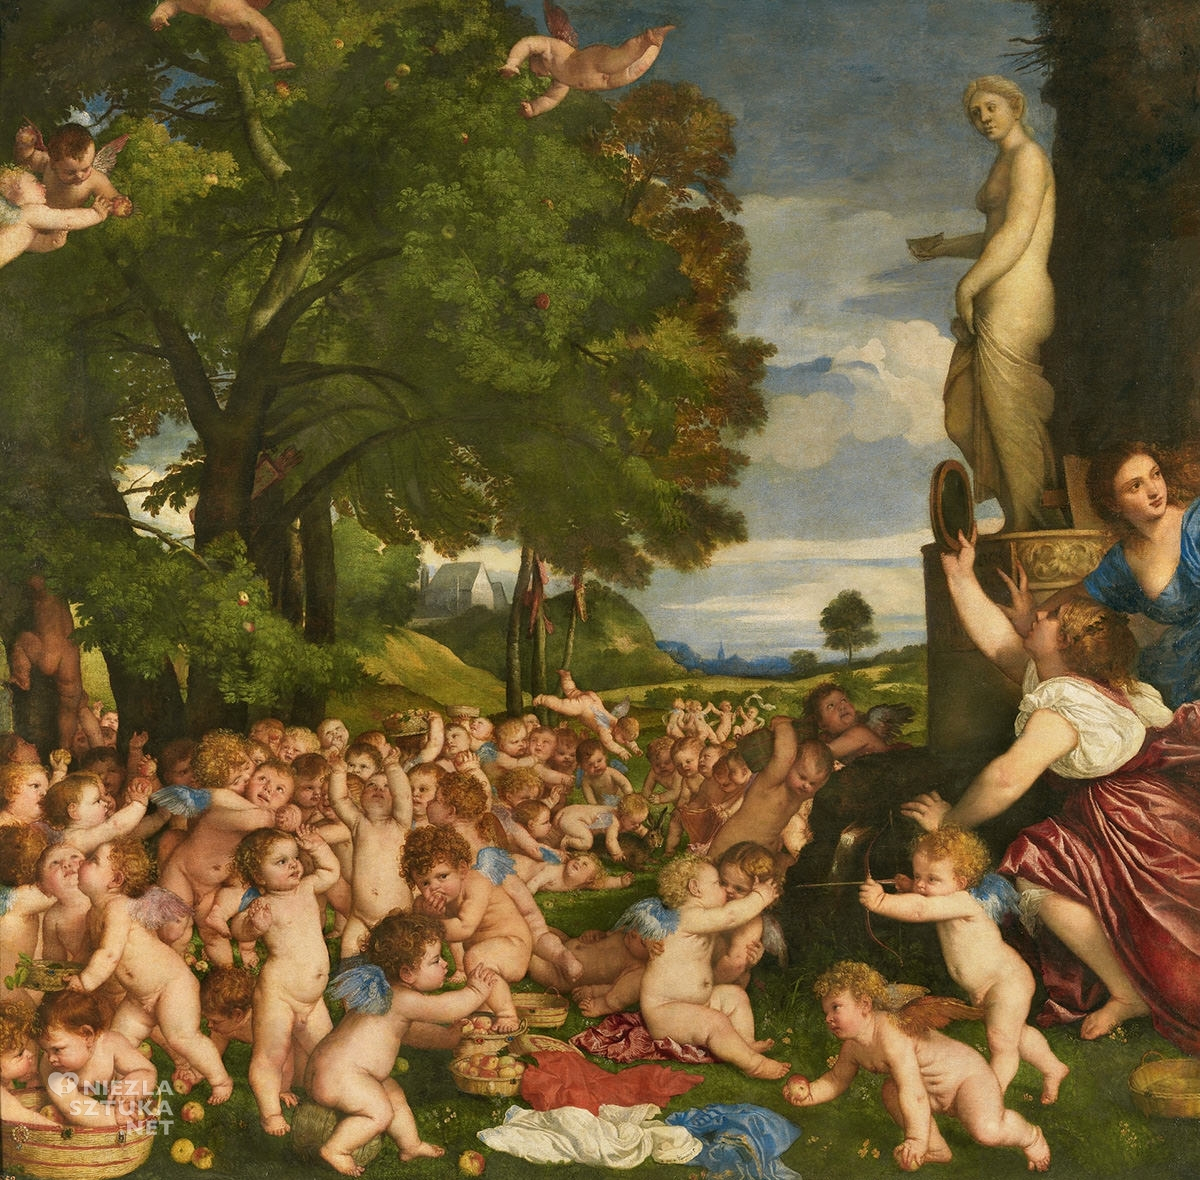 Tycjan, Święto Wenus, szkoła wenecka, renesans, sztuka włoska, Niezła Sztuka